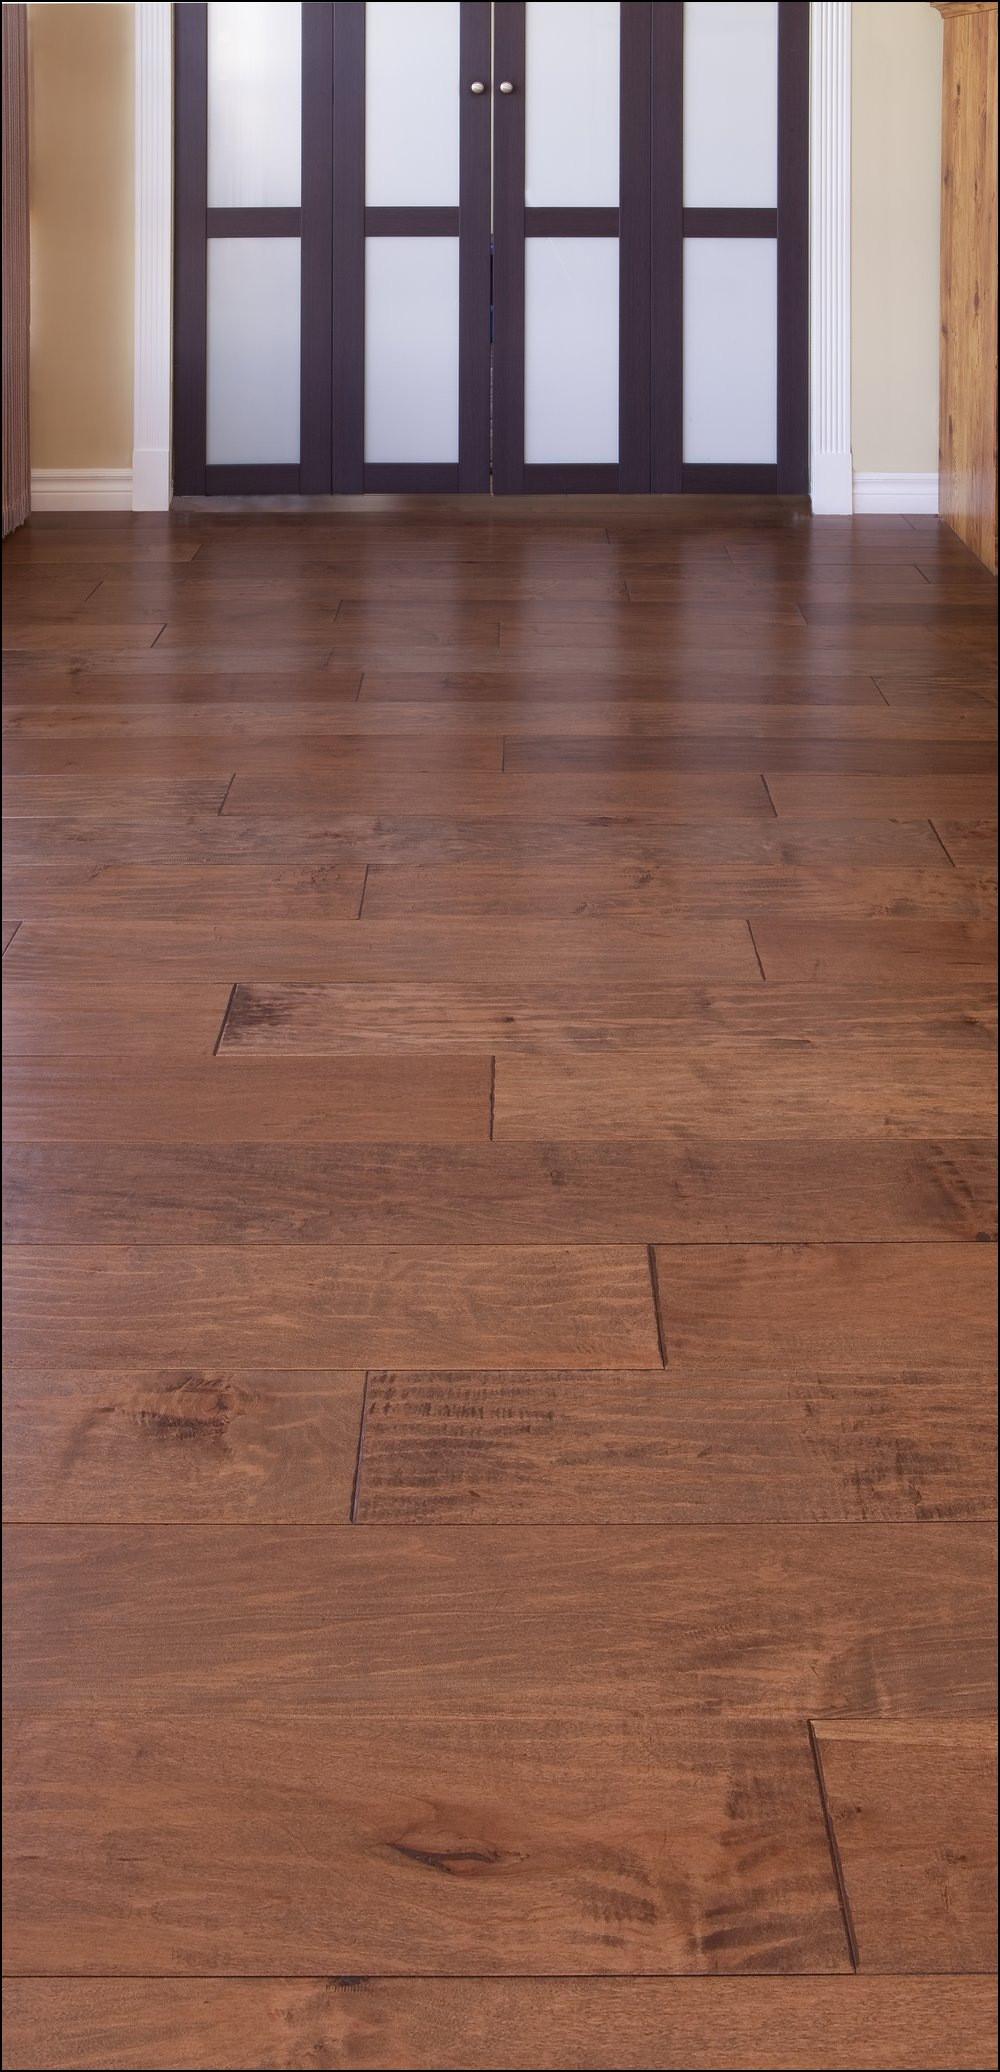 22 Lovable Hand Scraped Hardwood Flooring Reviews 2021 free download hand scraped hardwood flooring reviews of hand scraped vinyl plank flooring reviews flooring ideas for hand scraped vinyl plank flooring reviews boardwalk hardwood floors of hand scraped vin